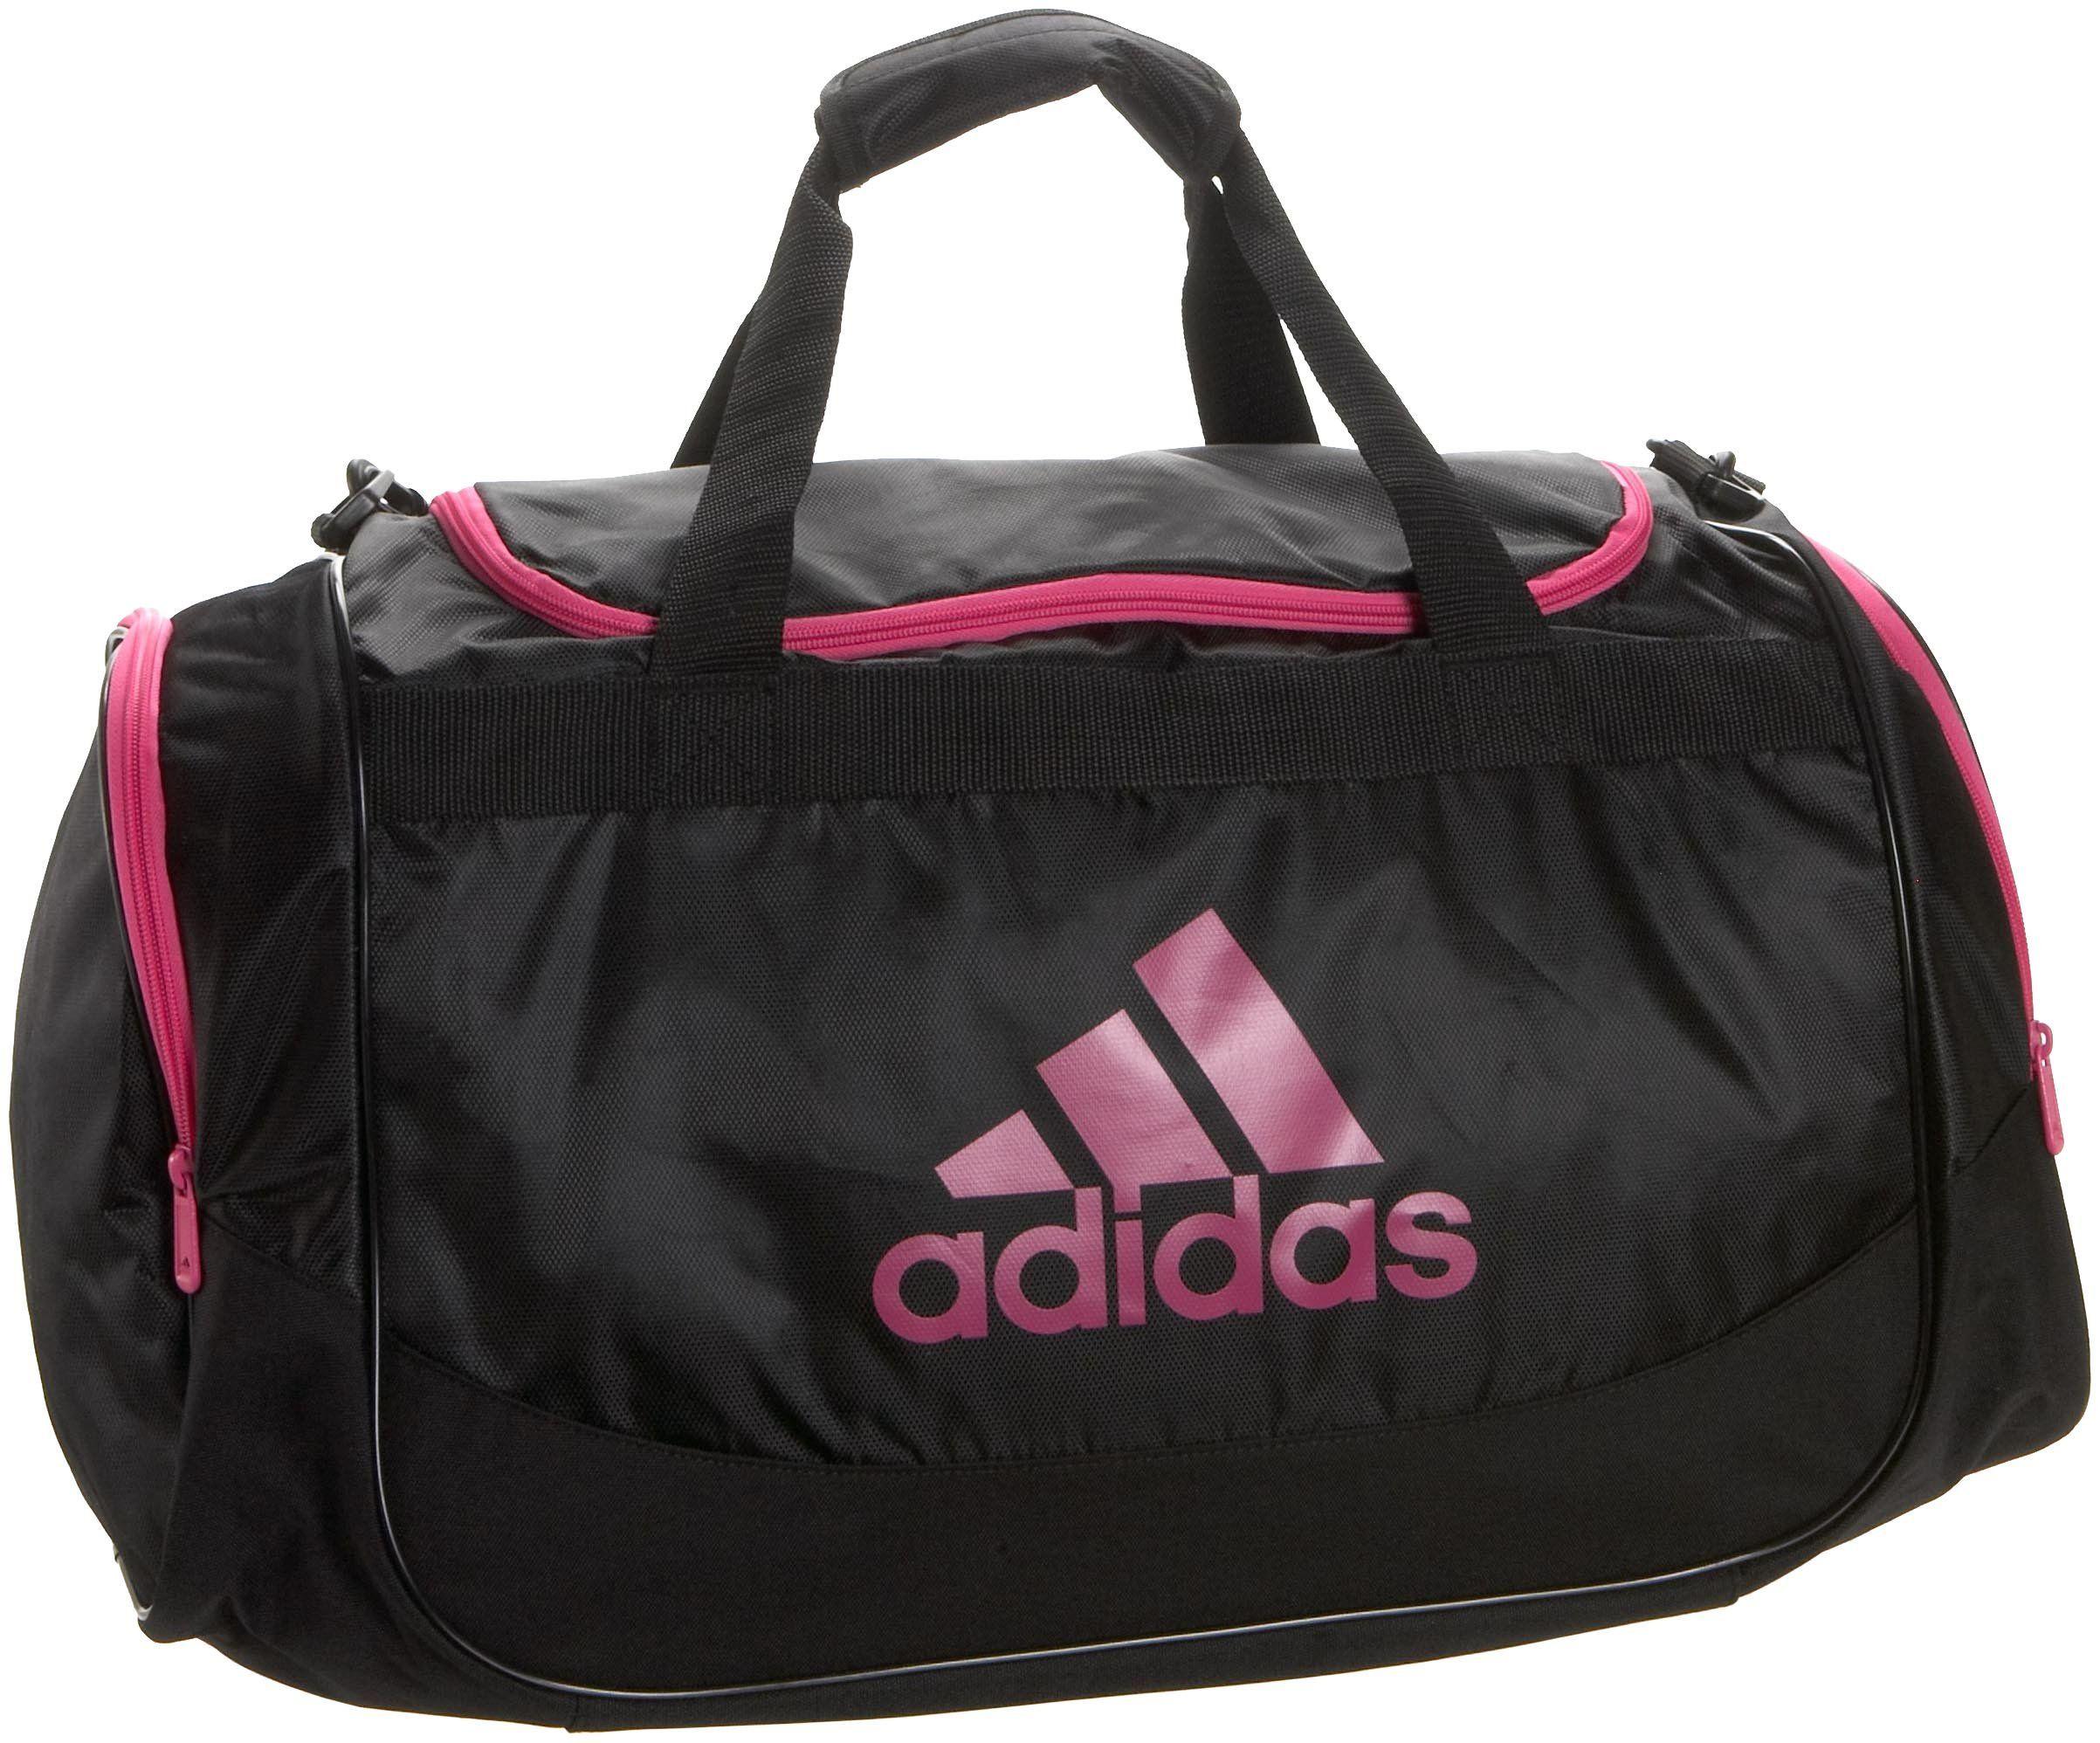 Adidas Defender Medium Duffel One Size 13 X 24 12 Inch Sports Outdoors